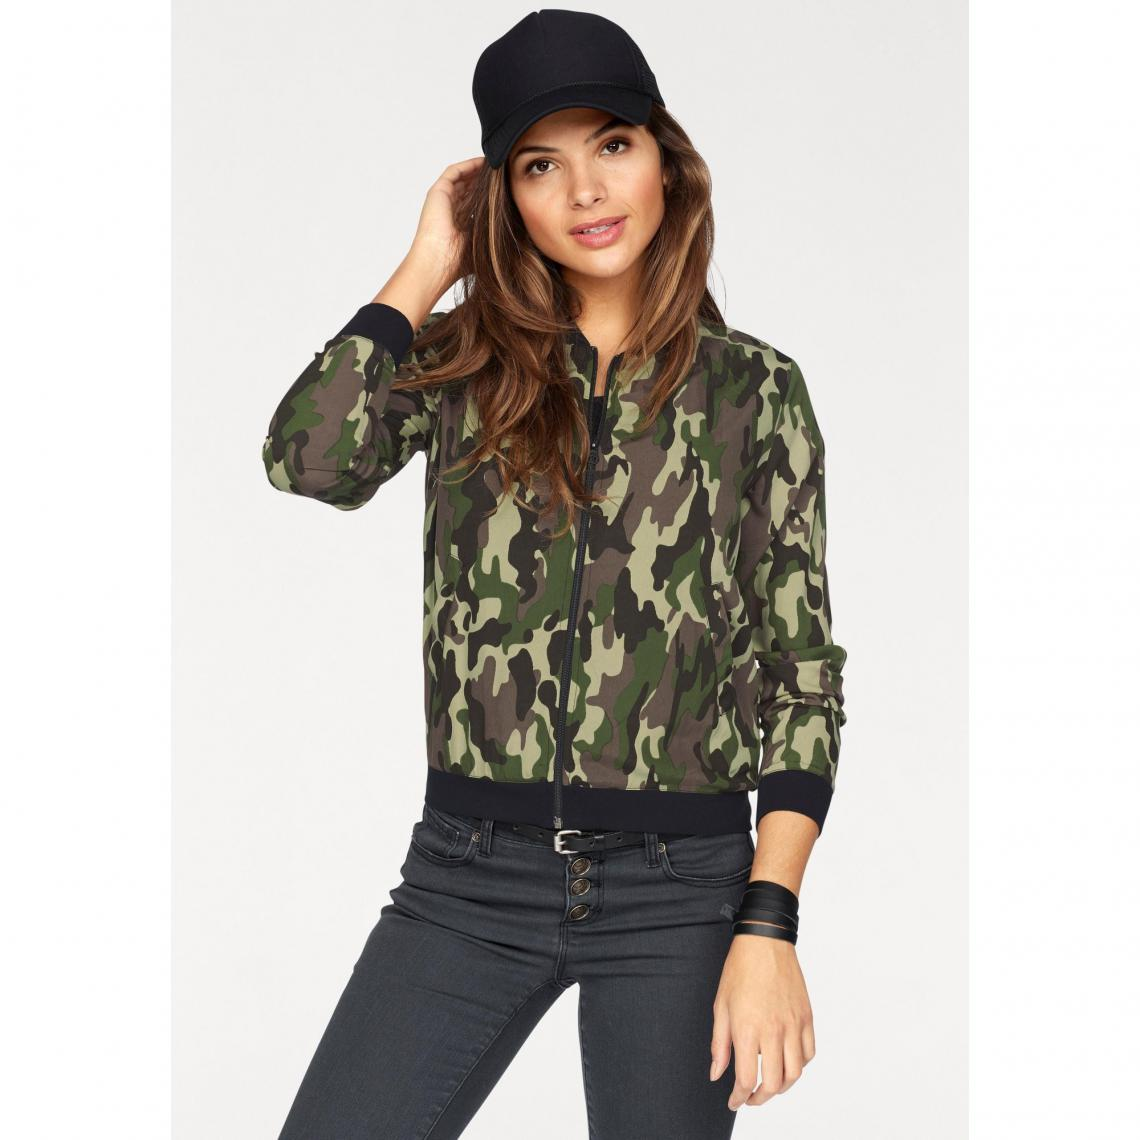 Blouson Camouflage Zippé Imprimé Ajc Kaki Style Femme Bomber K1lJ3TFc